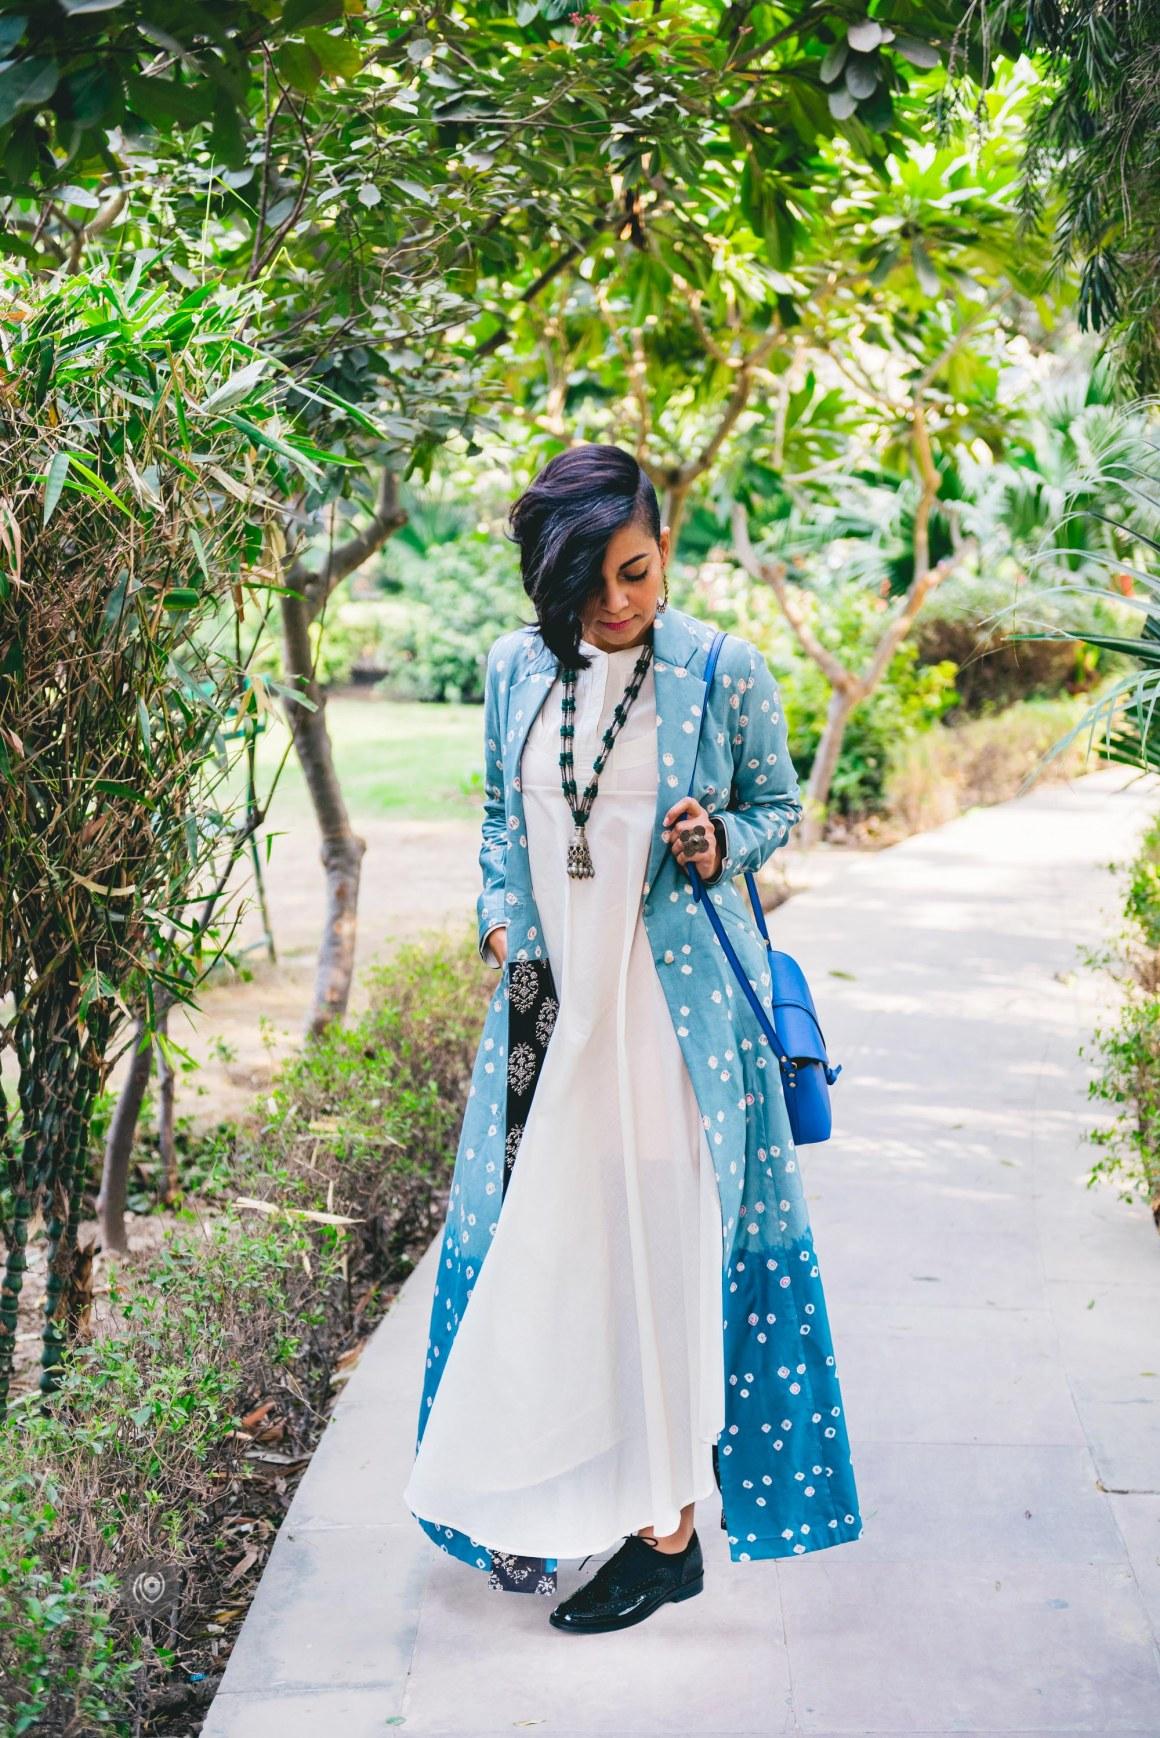 #CoverUp 61 #MadeInIndia with Raiman, Chiaroscuro, Maharani Baug, Vanilla Moon, Naina.co, Naina Redhu, Luxury Photographer, Lifestyle Photographer, Luxury Blogger, Lifestyle Blogger, Experience Collector, Personal Style